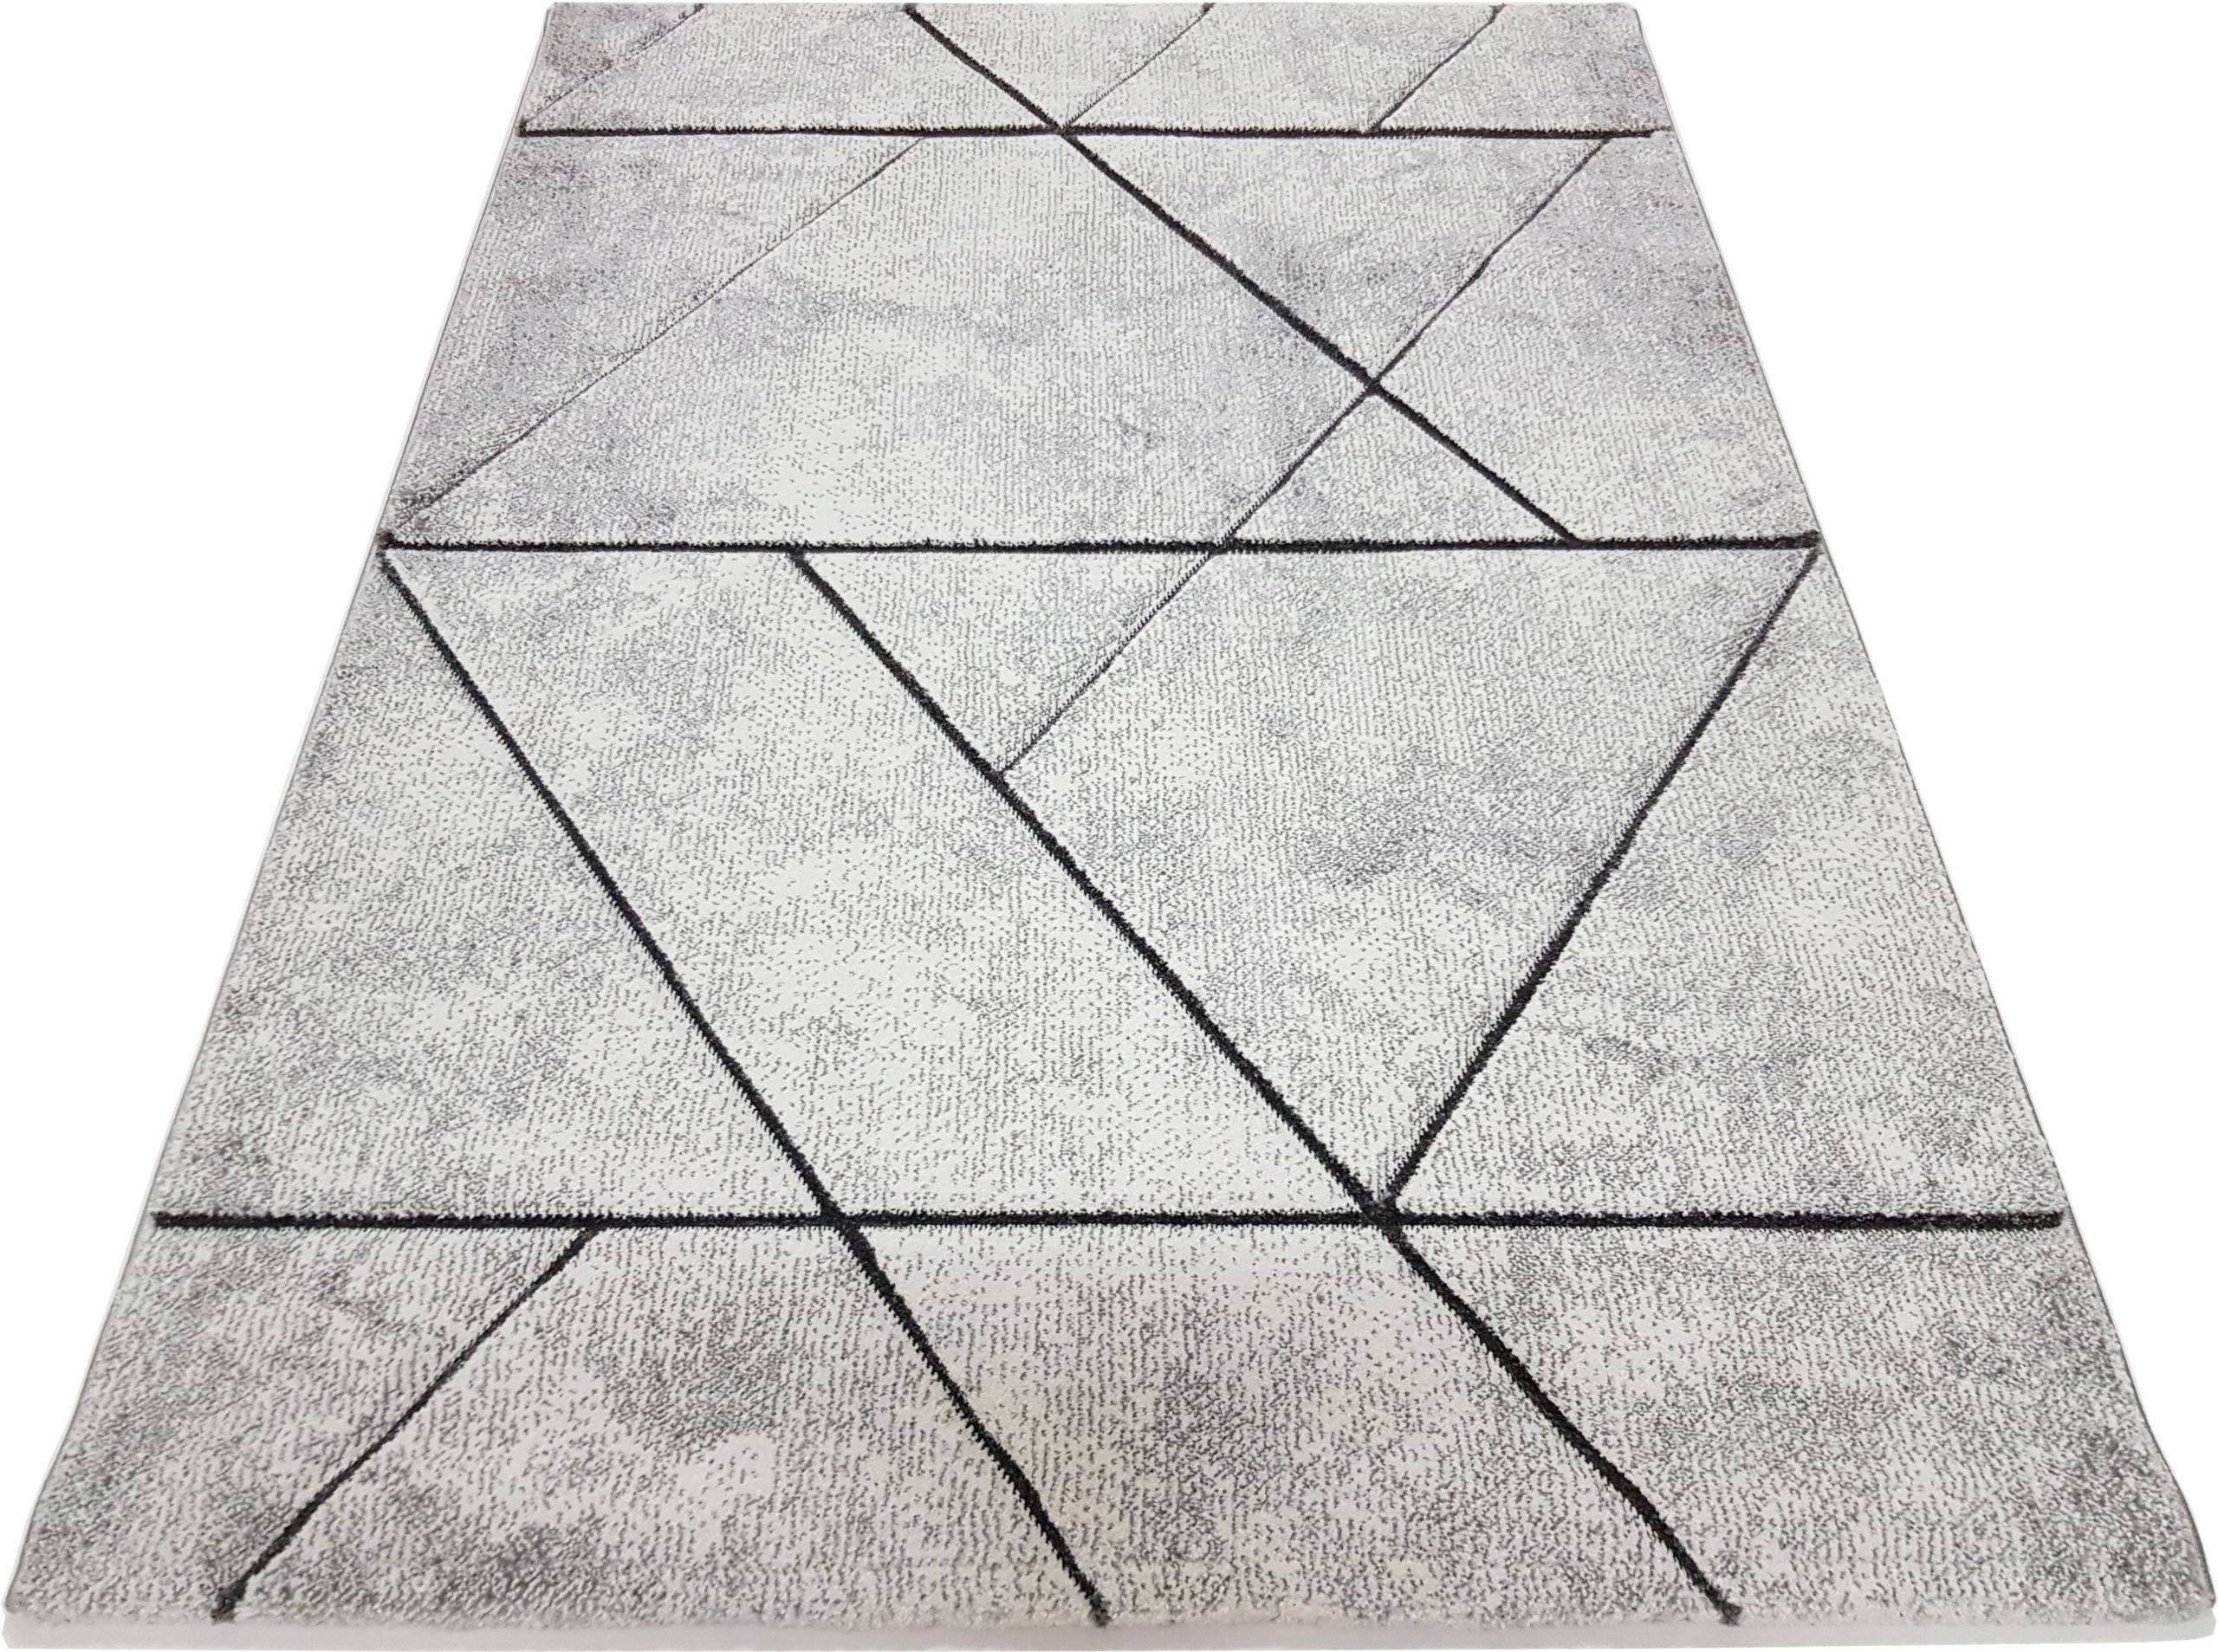 Koberec Koberec 80x150 3D DIAMOND dash sivý popol BELIS